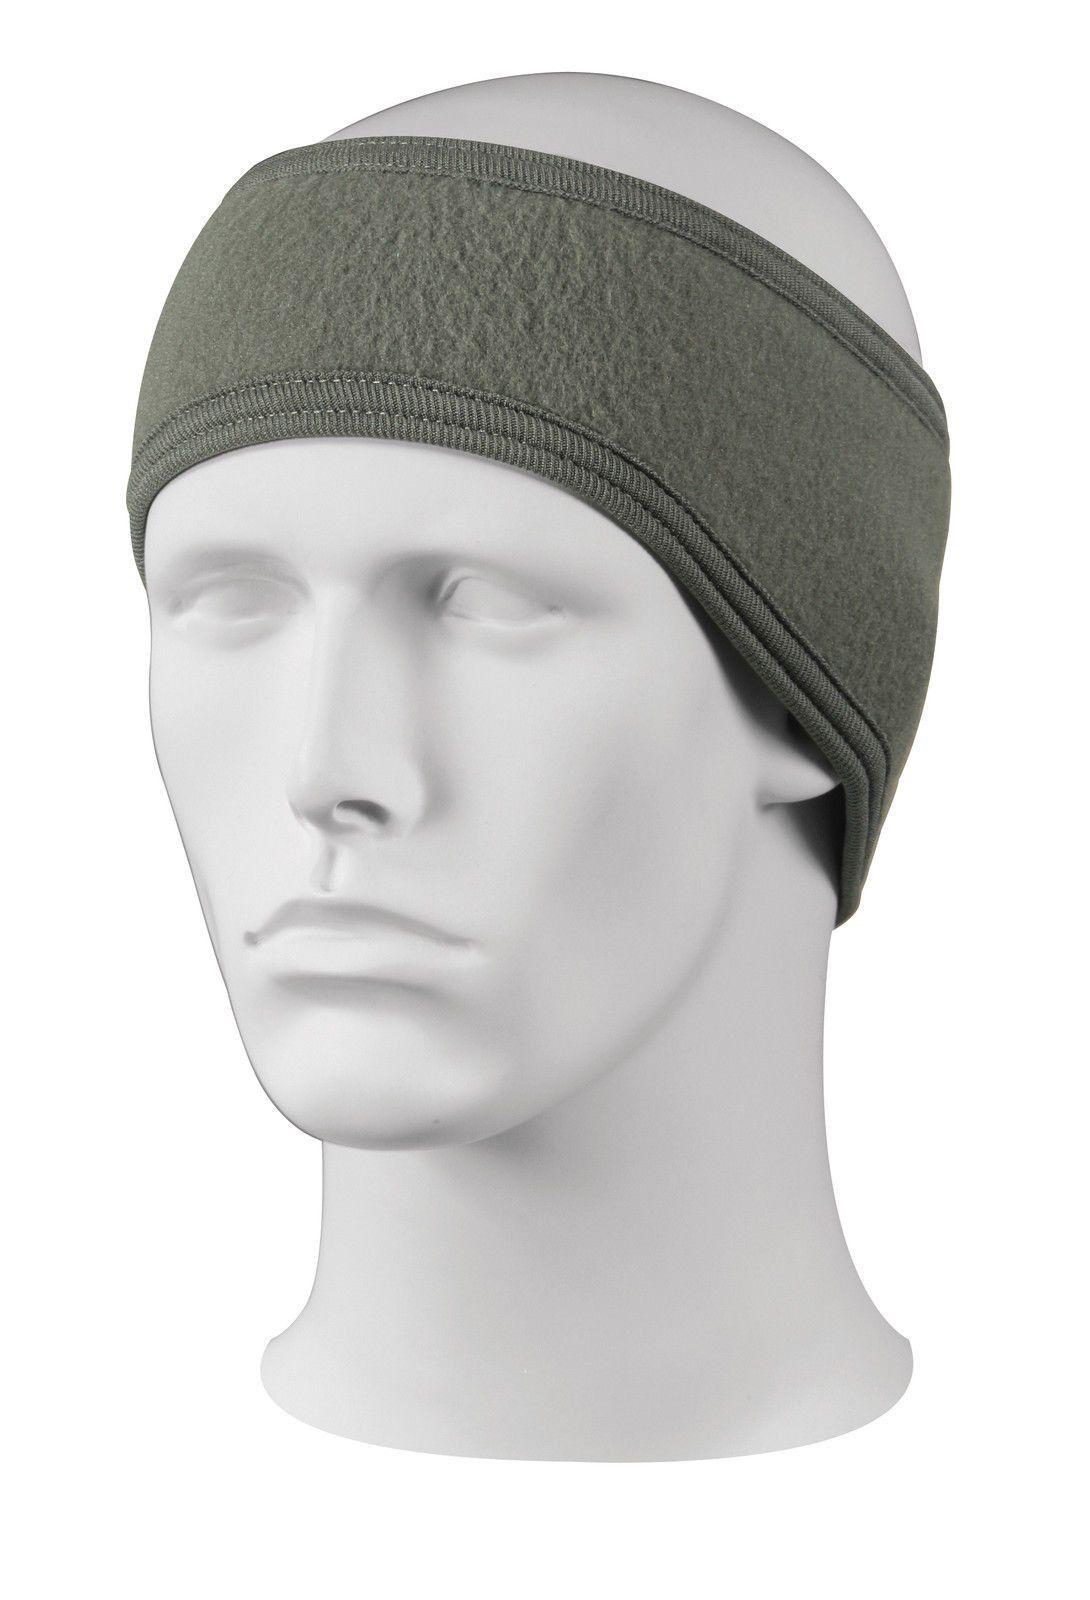 Heavyweight Fleece 2 Ply Headband Ear Warmer Black 6e683a585c3